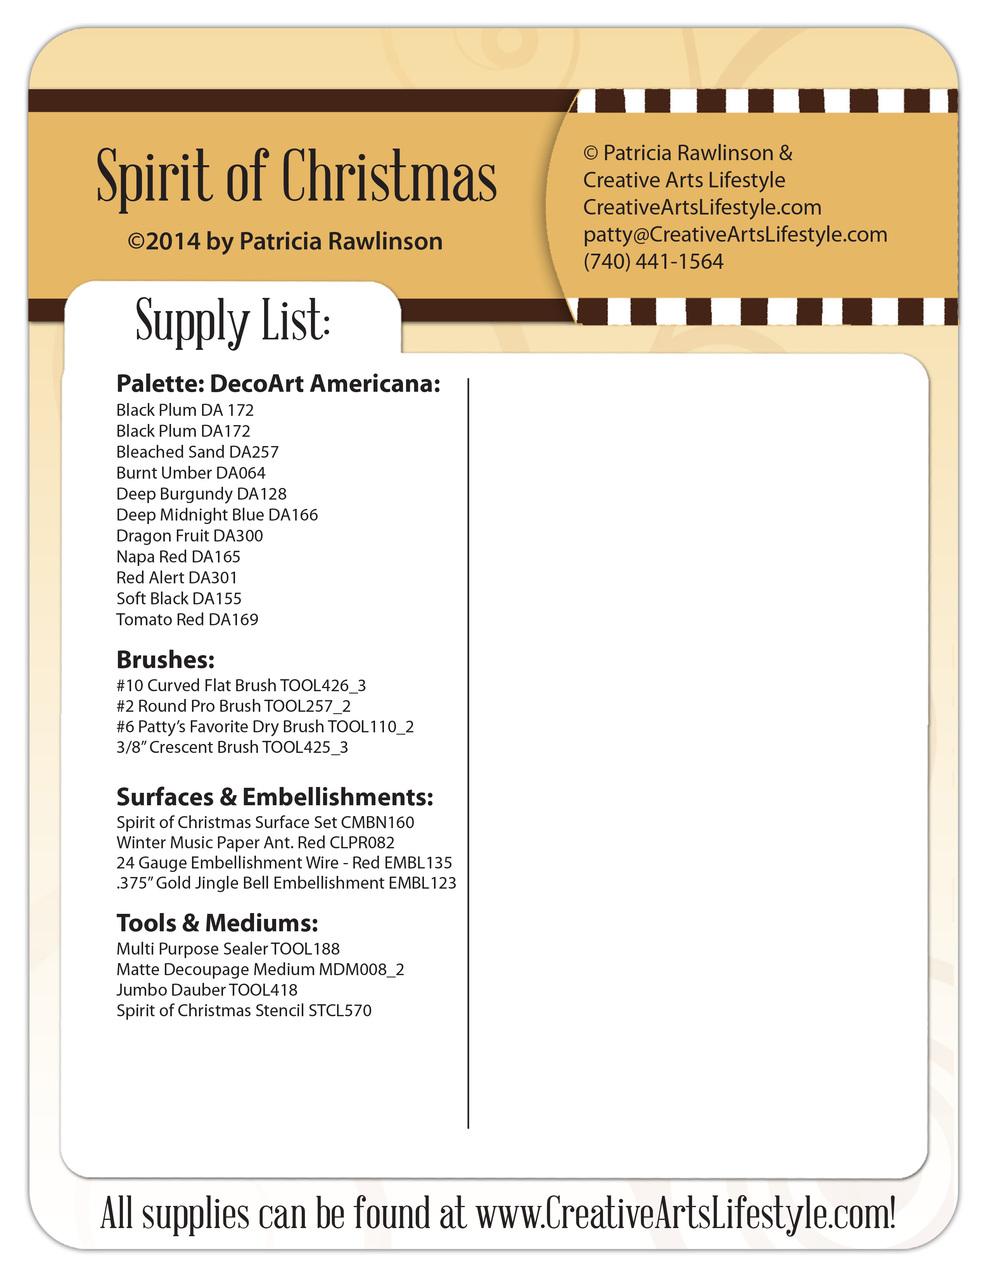 Spirit of Christmas Pattern Packet - Patricia Rawlinson